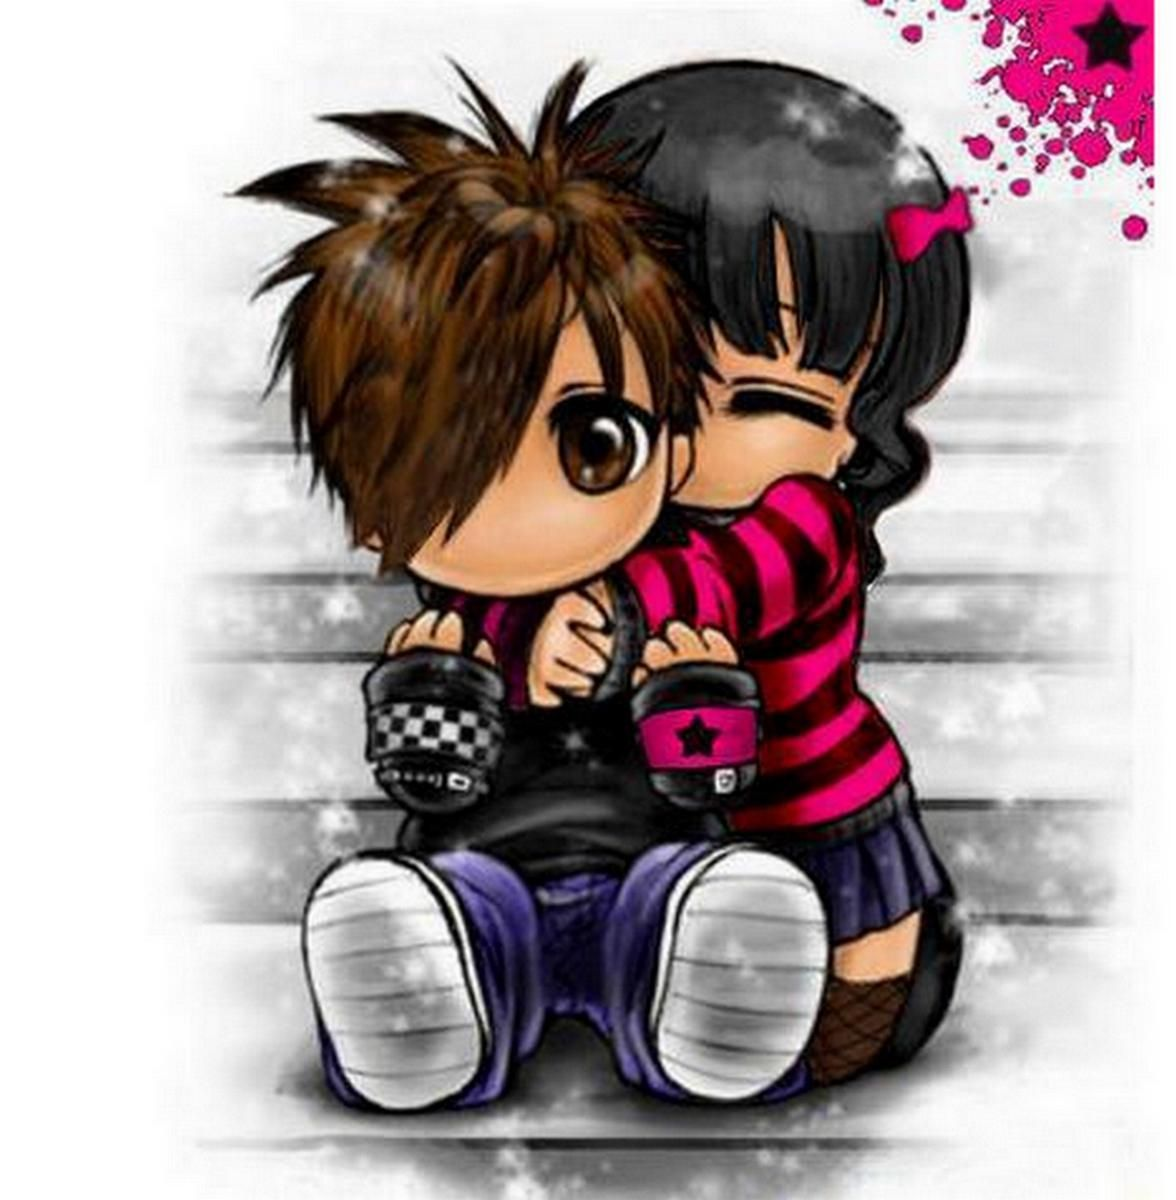 Friendship hugs boygirl lucky ones anime love chibi couple